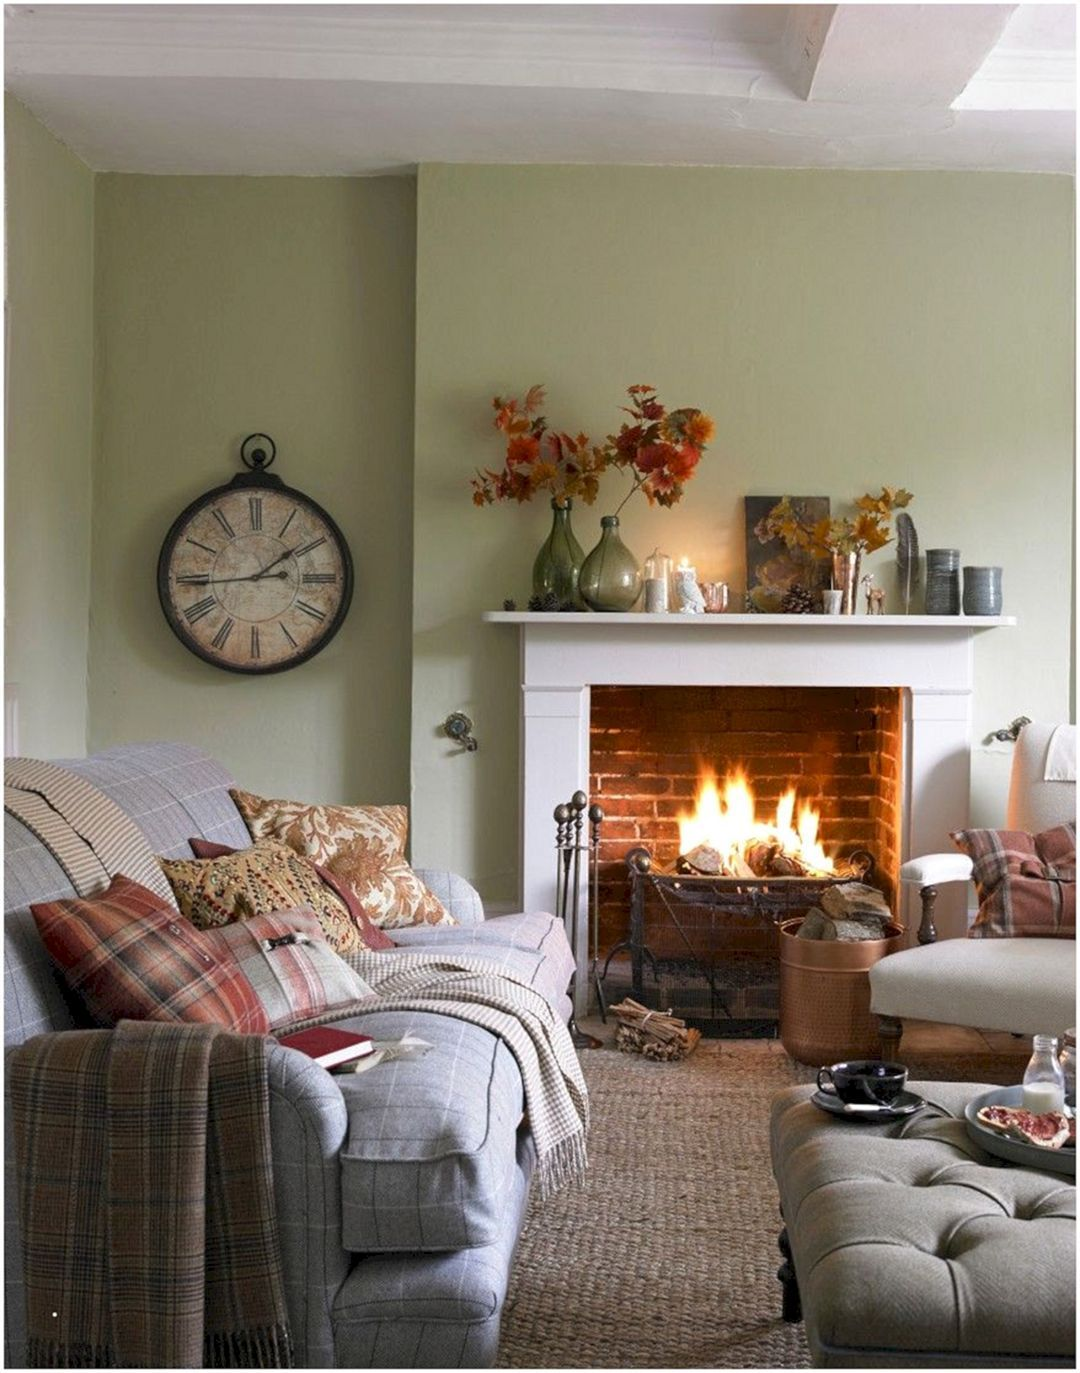 15 Fascinating Diy Fall Living Room Decoration With Fireplace Ideas Freshouz Com Small Living Room Decor Living Room Warm Country Living Room